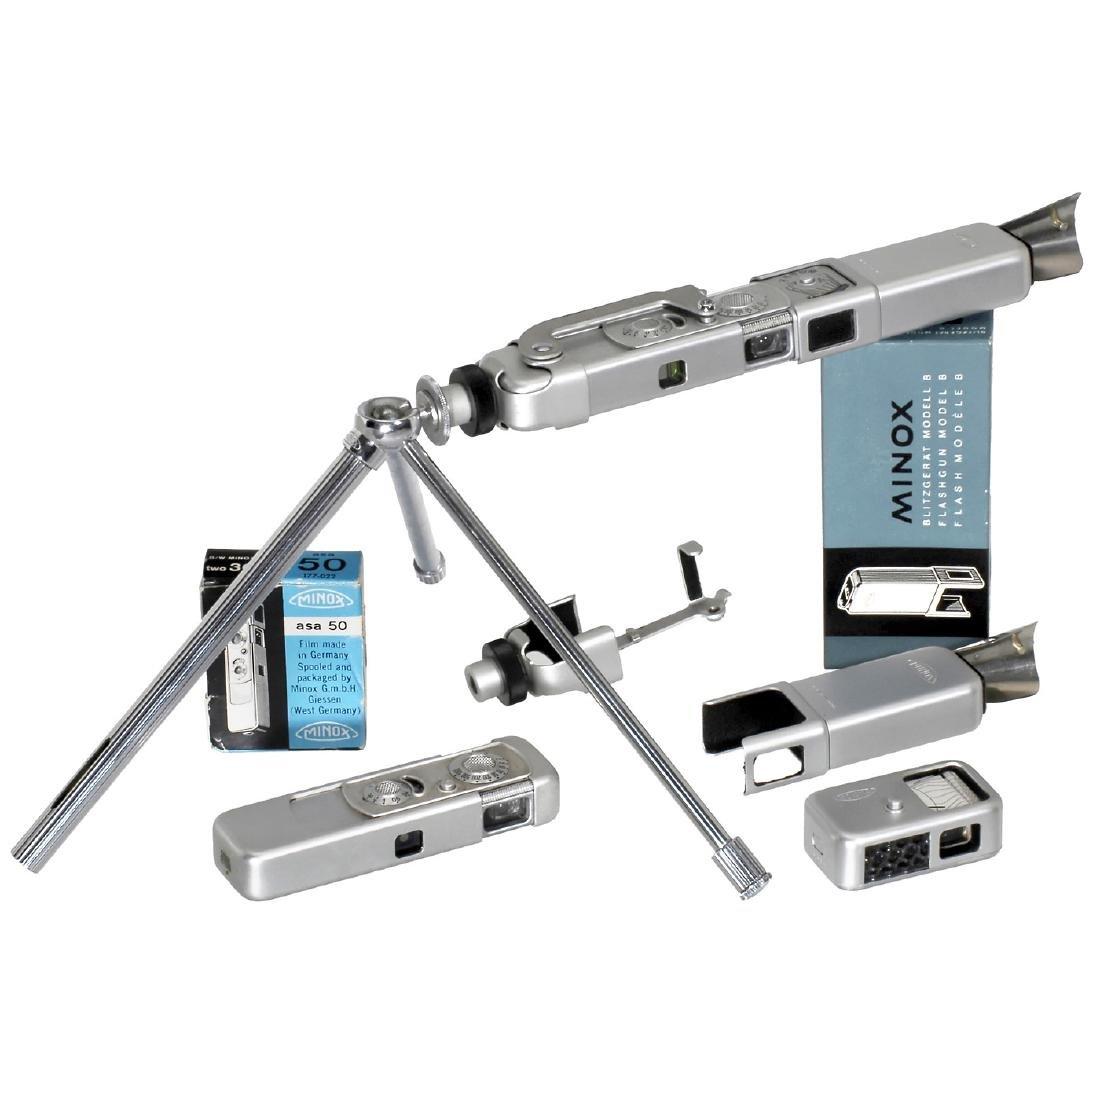 Minox Cameras and Accessories - 2